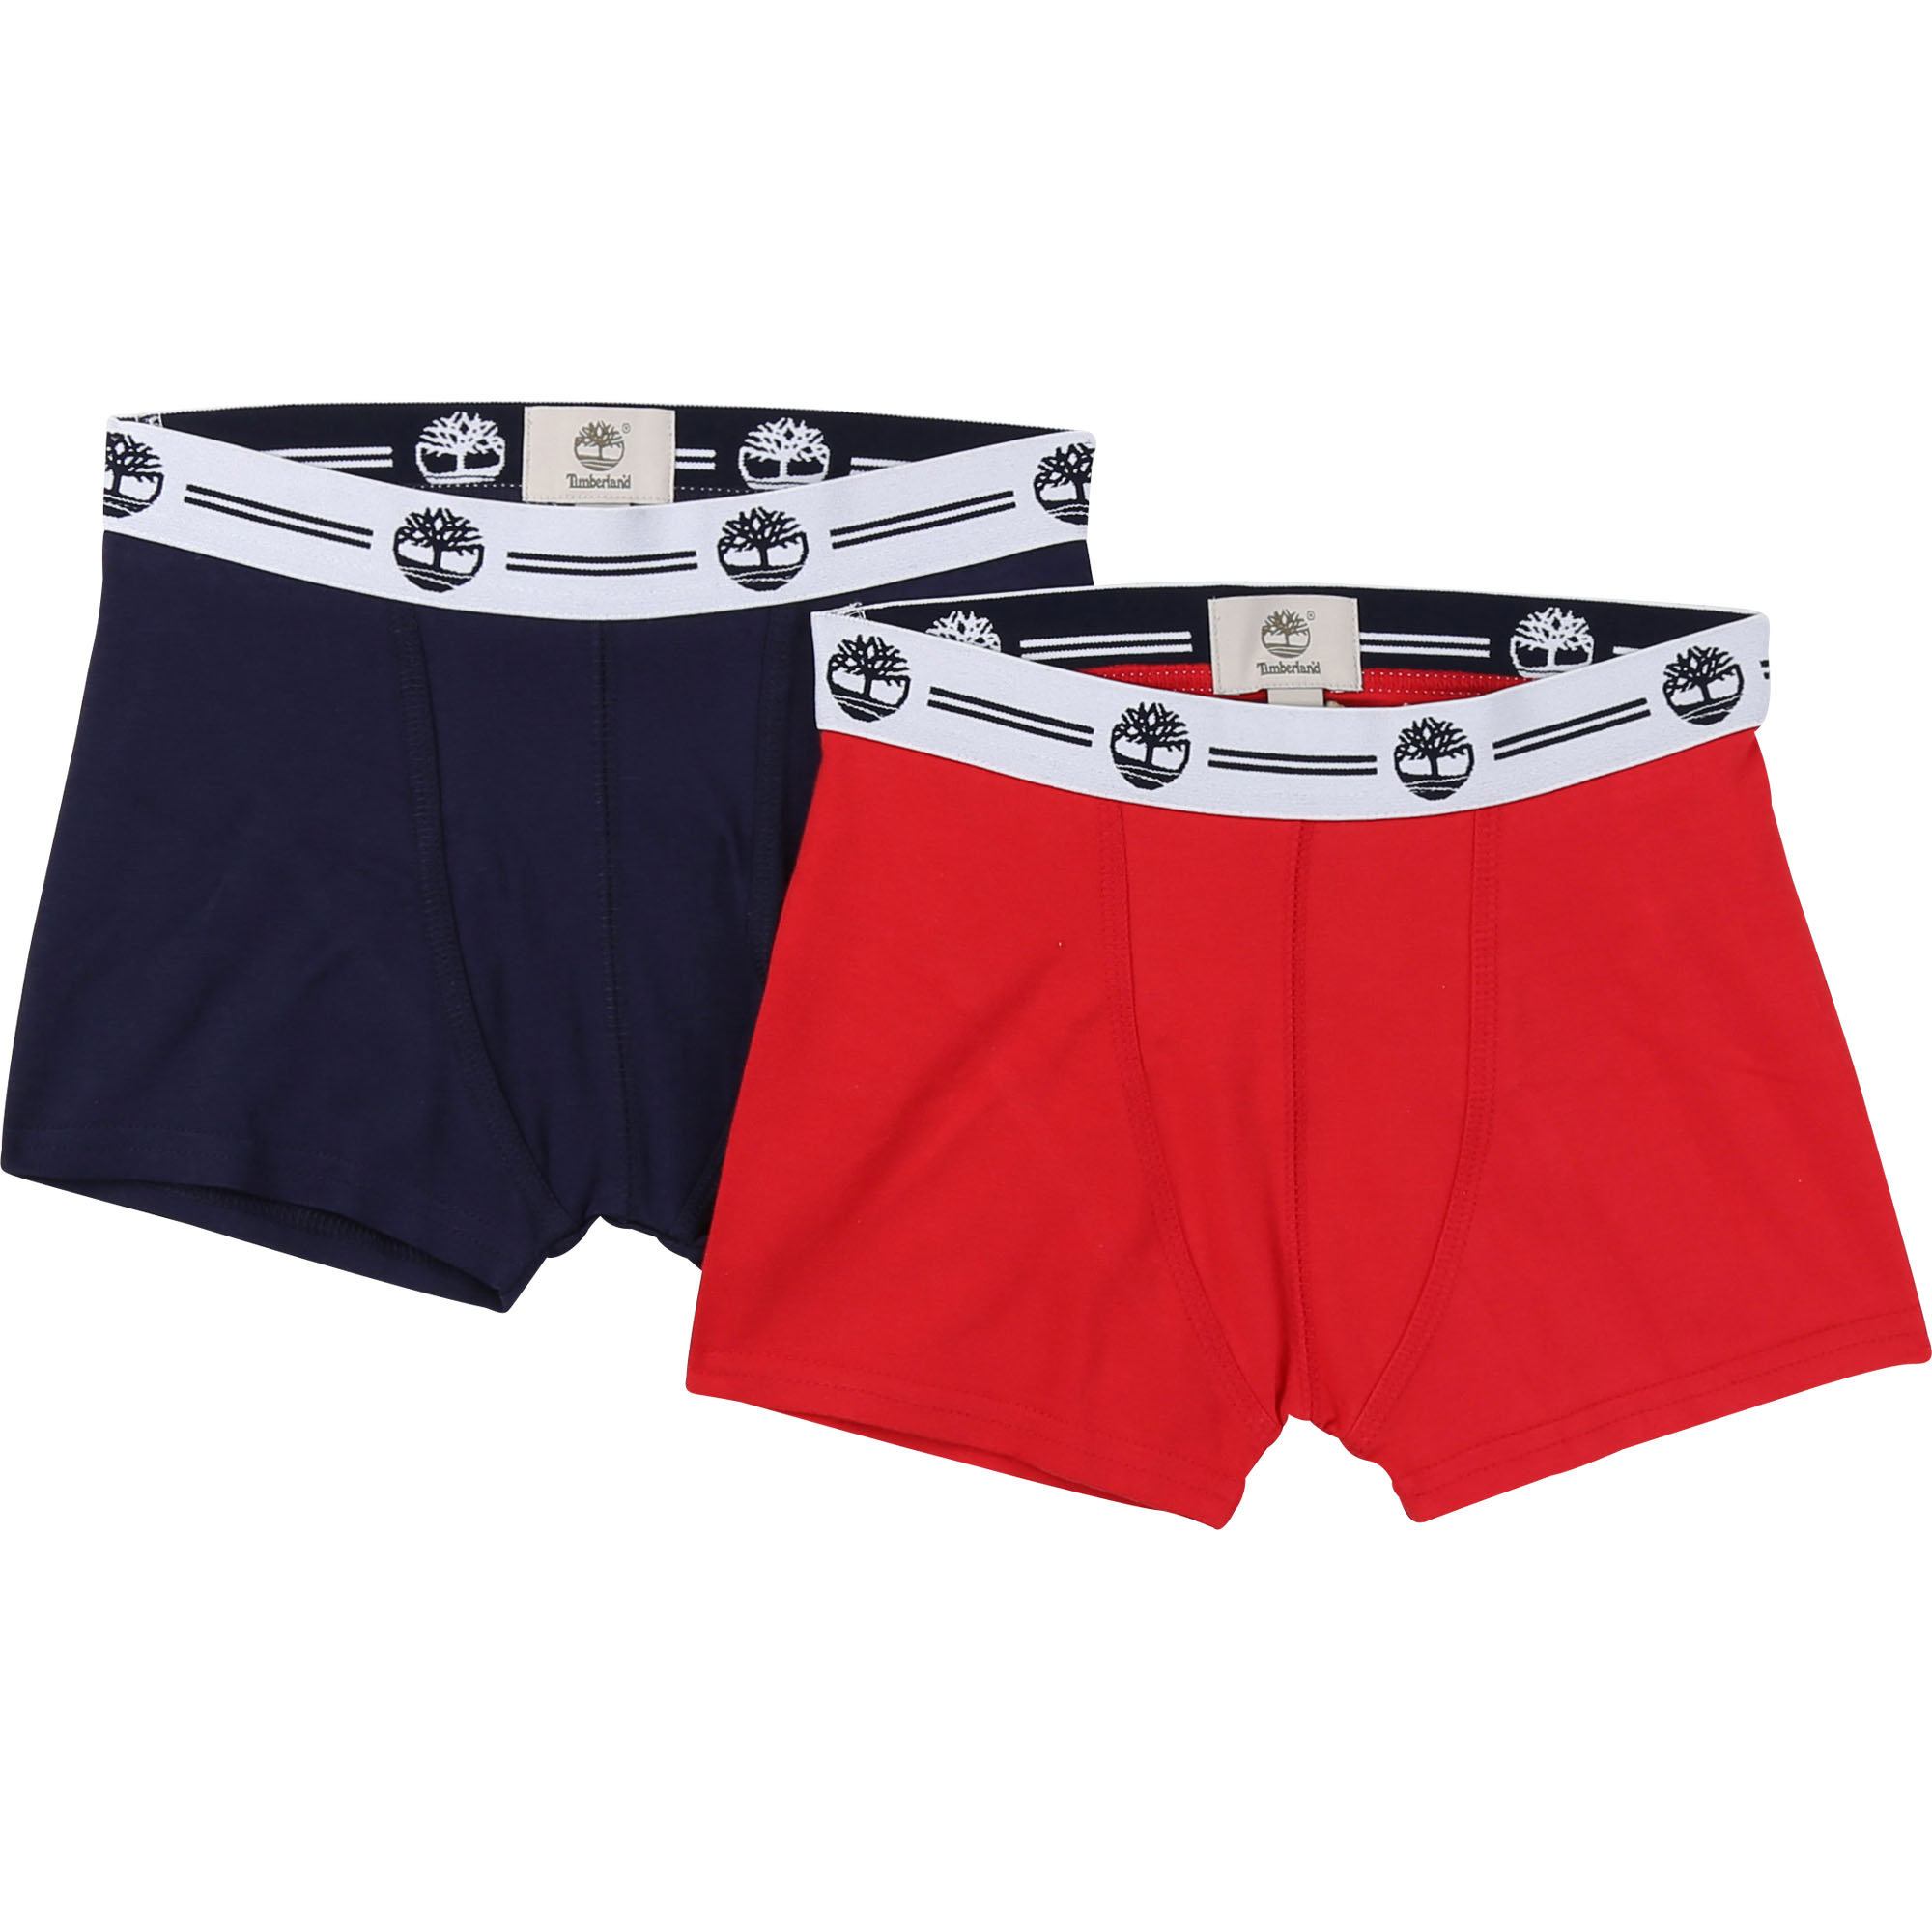 Lot de 2 boxers en jersey TIMBERLAND ENFANT GARCON Rouge